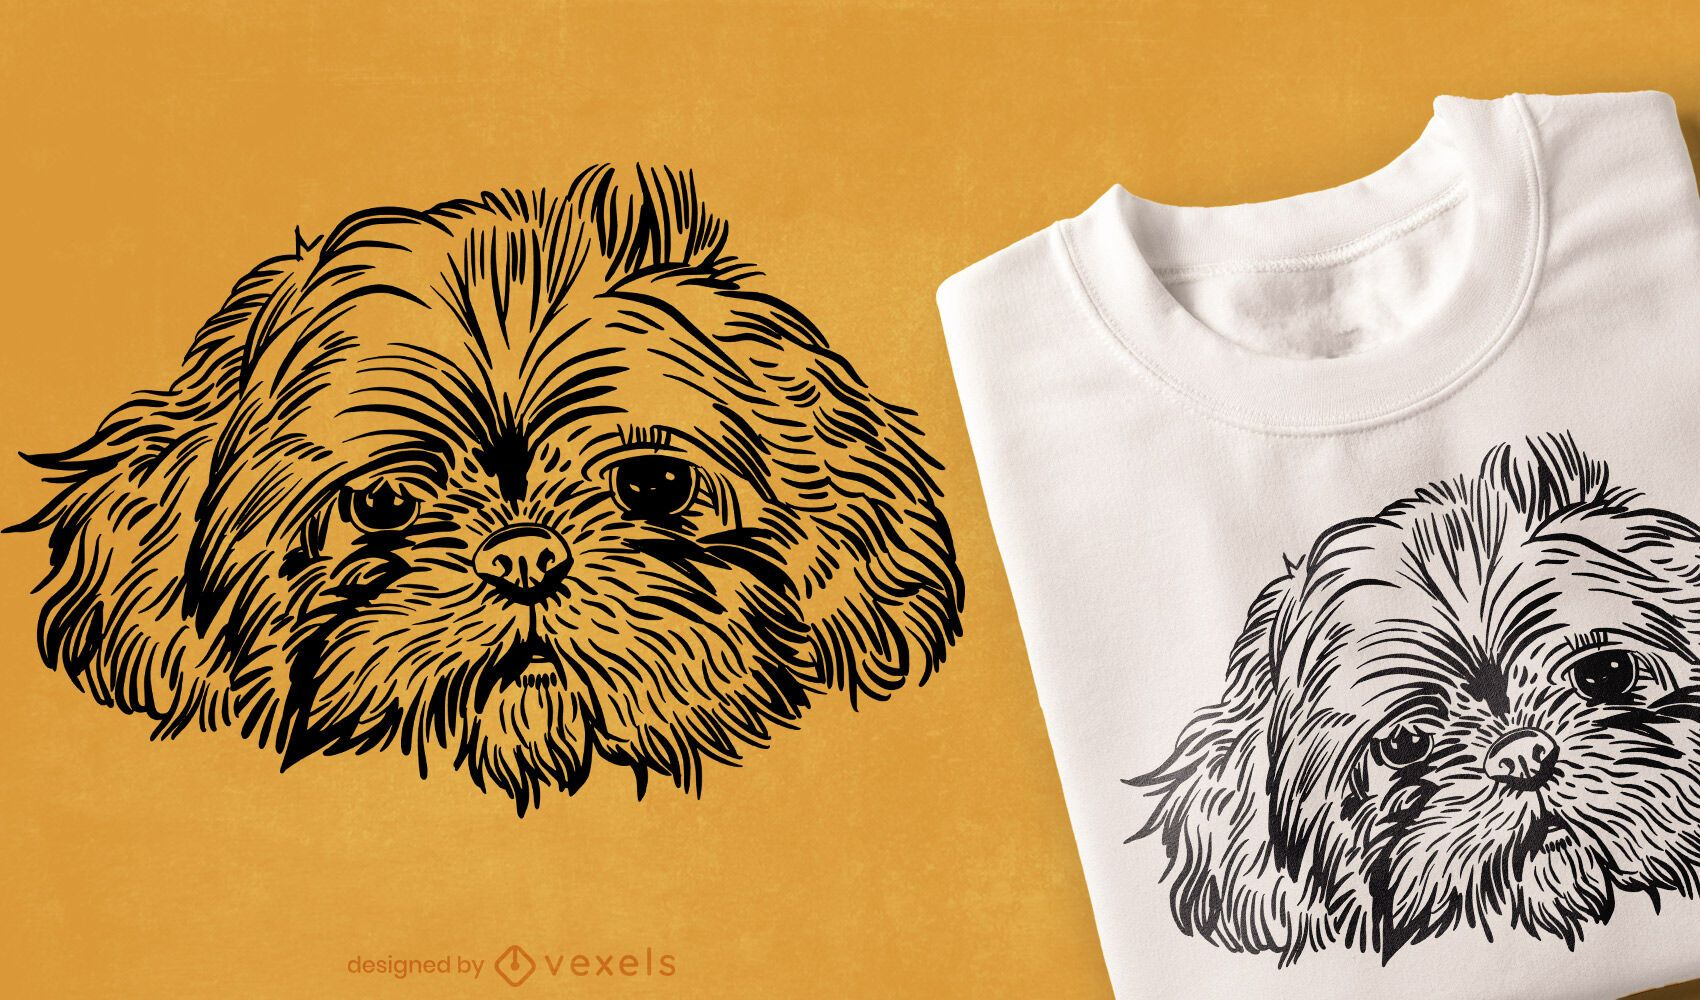 Hand drawn dog face t-shirt design